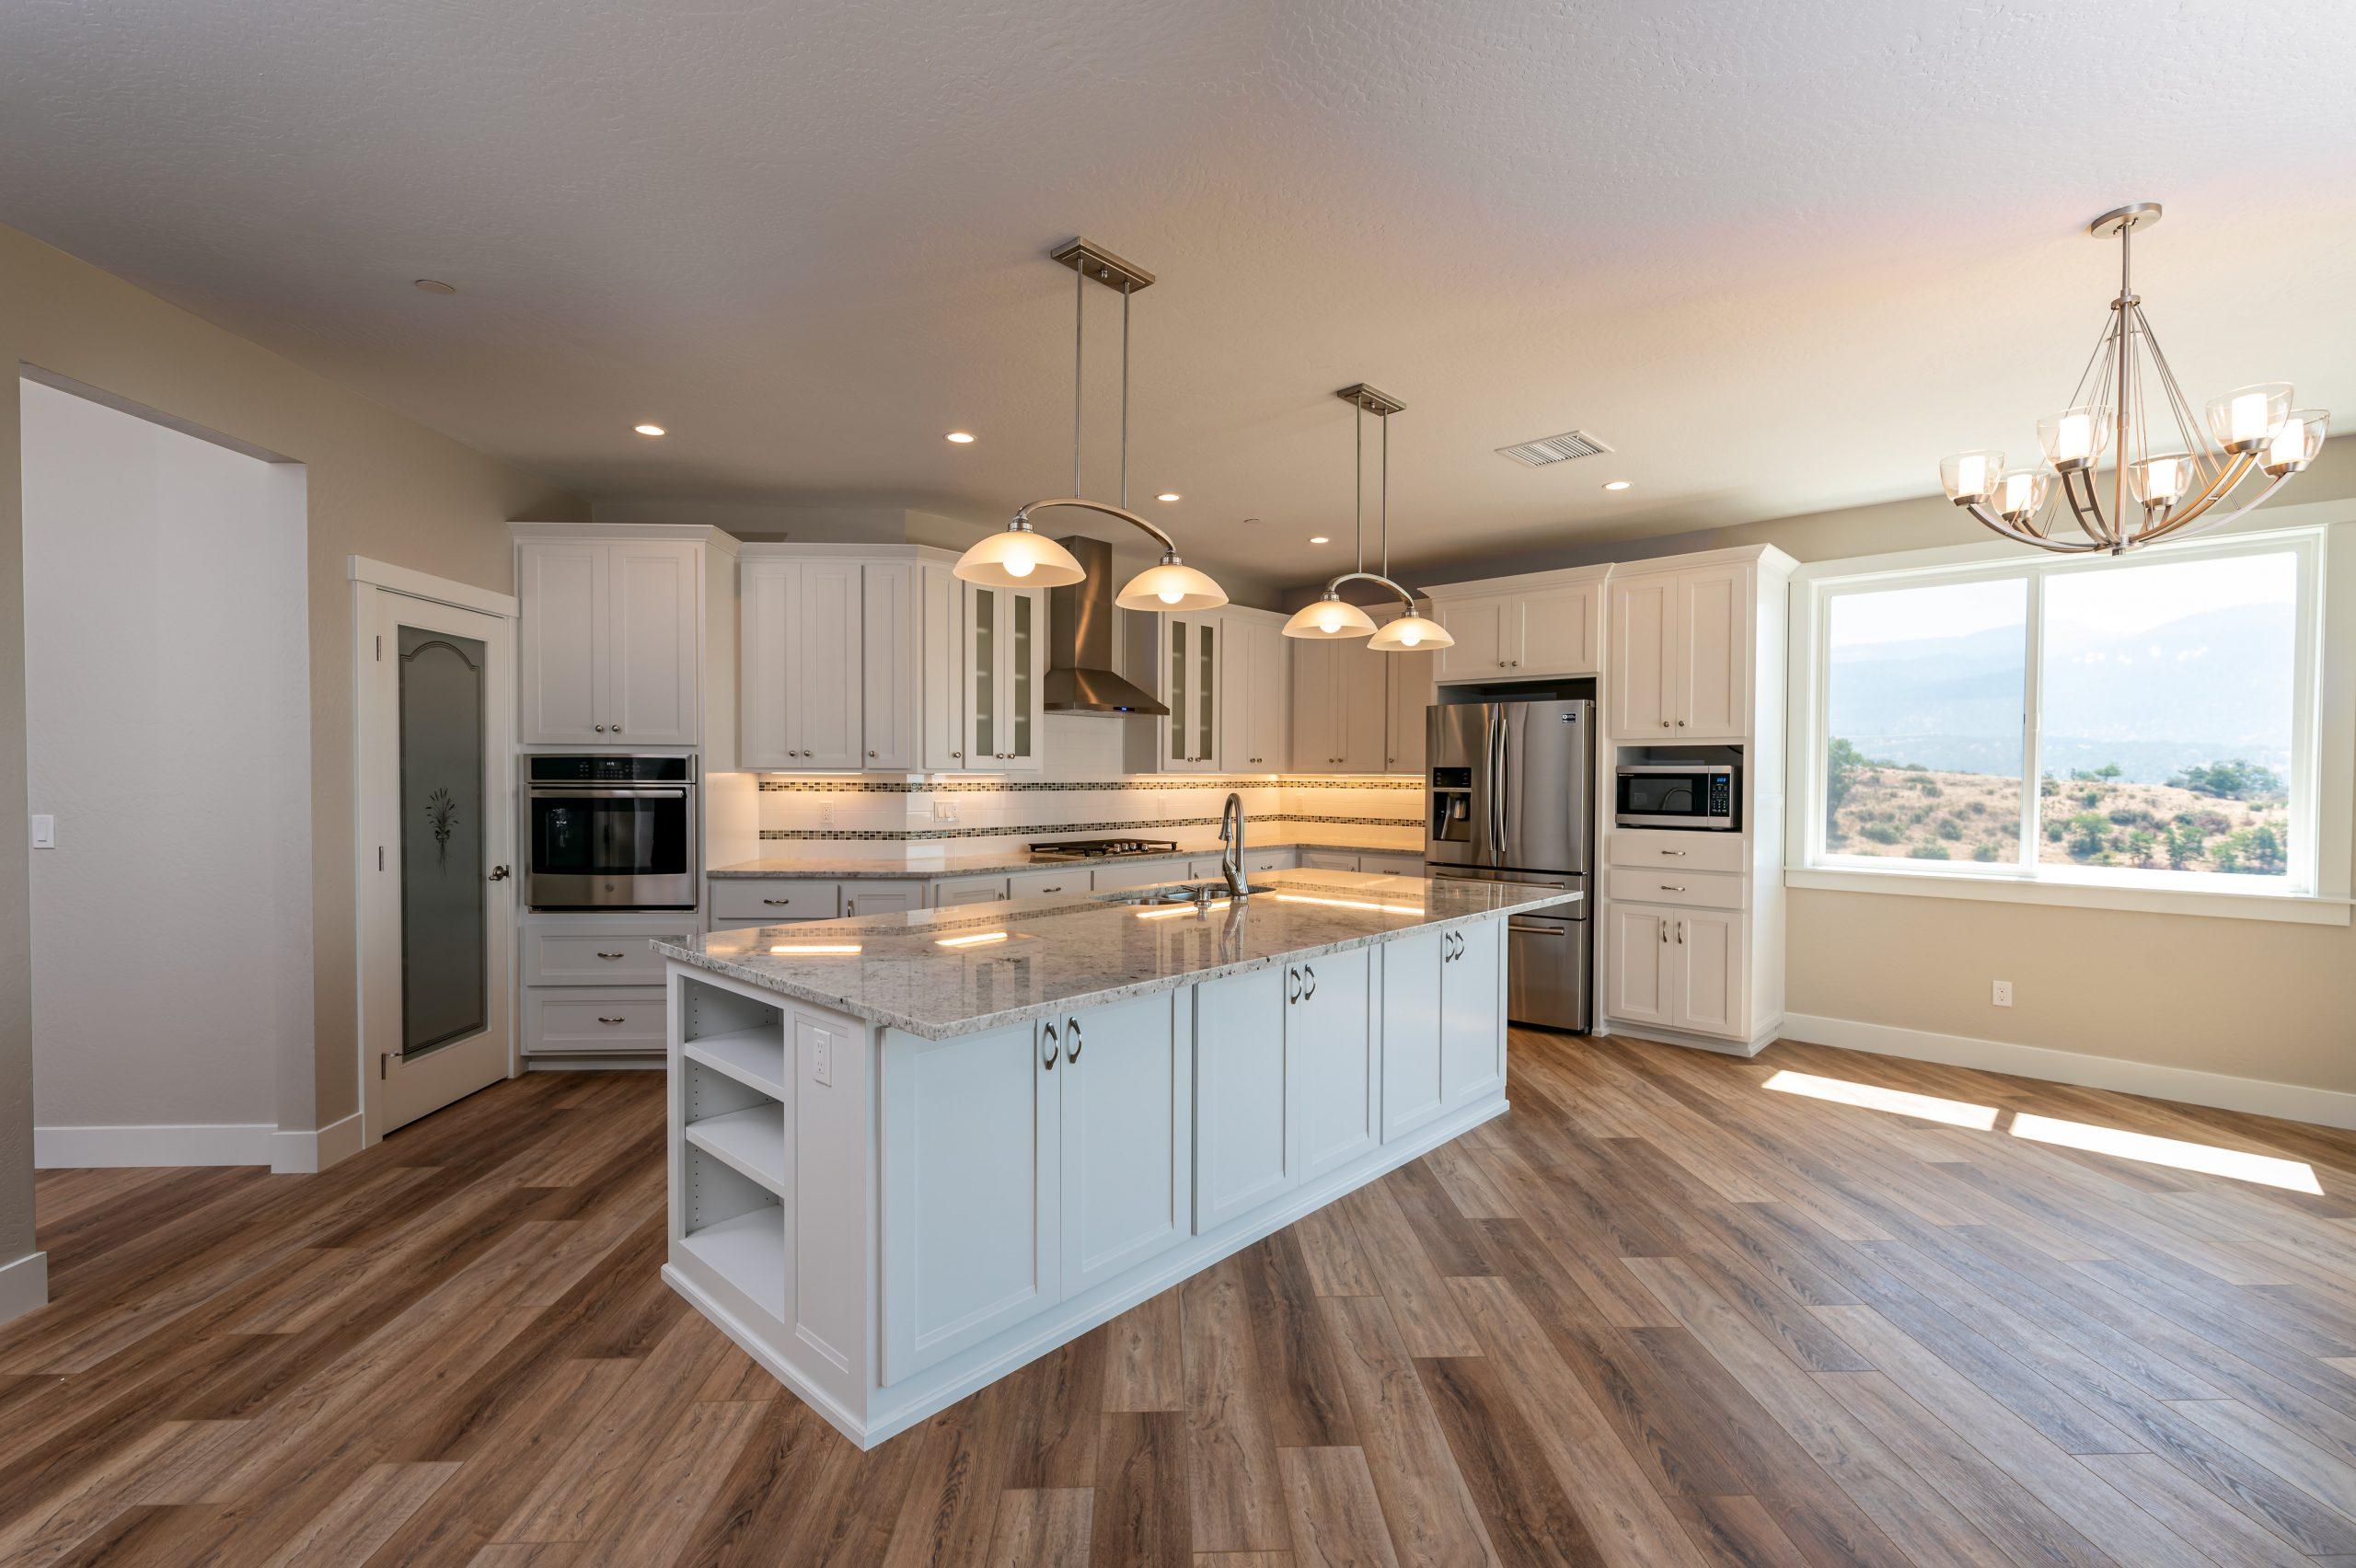 Kitchen Interior Construction Project